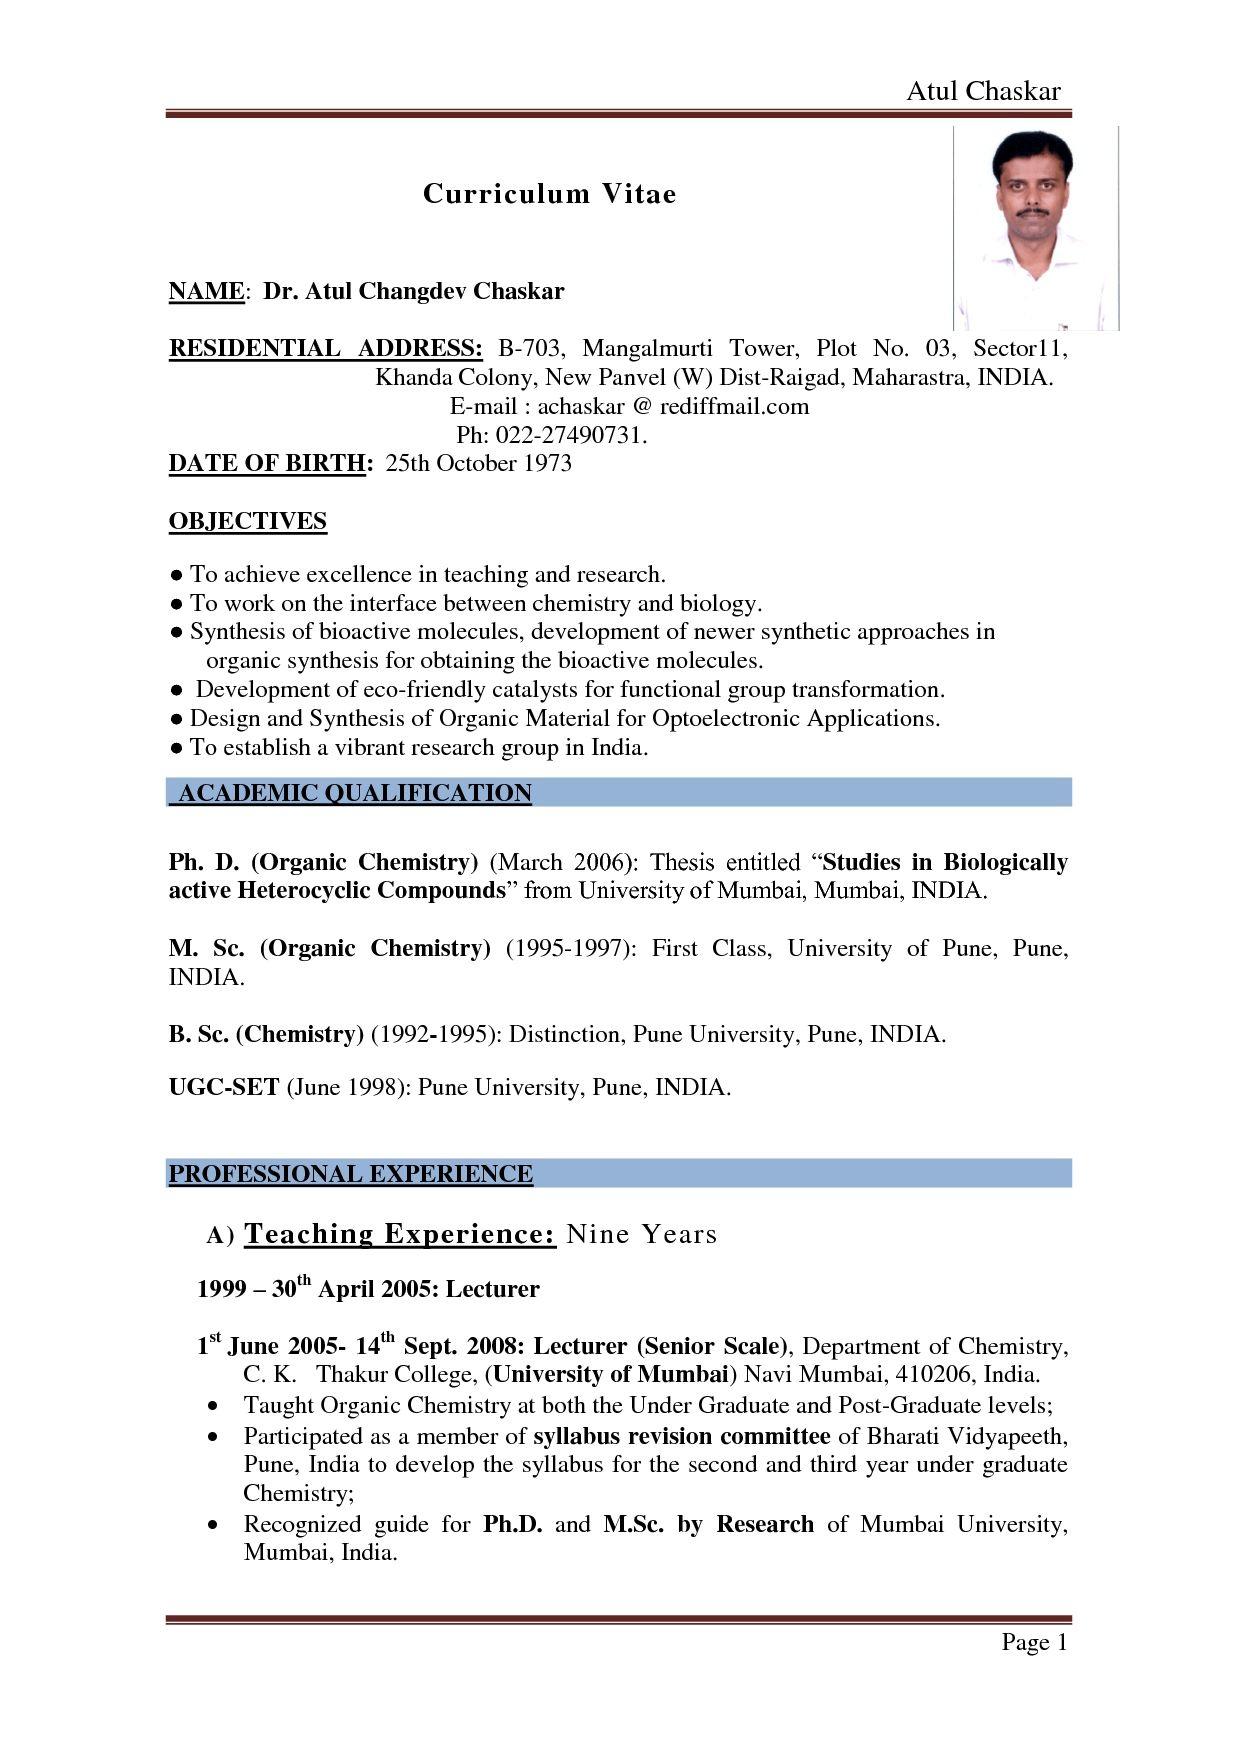 Resume Format India Job resume examples, Resume writing